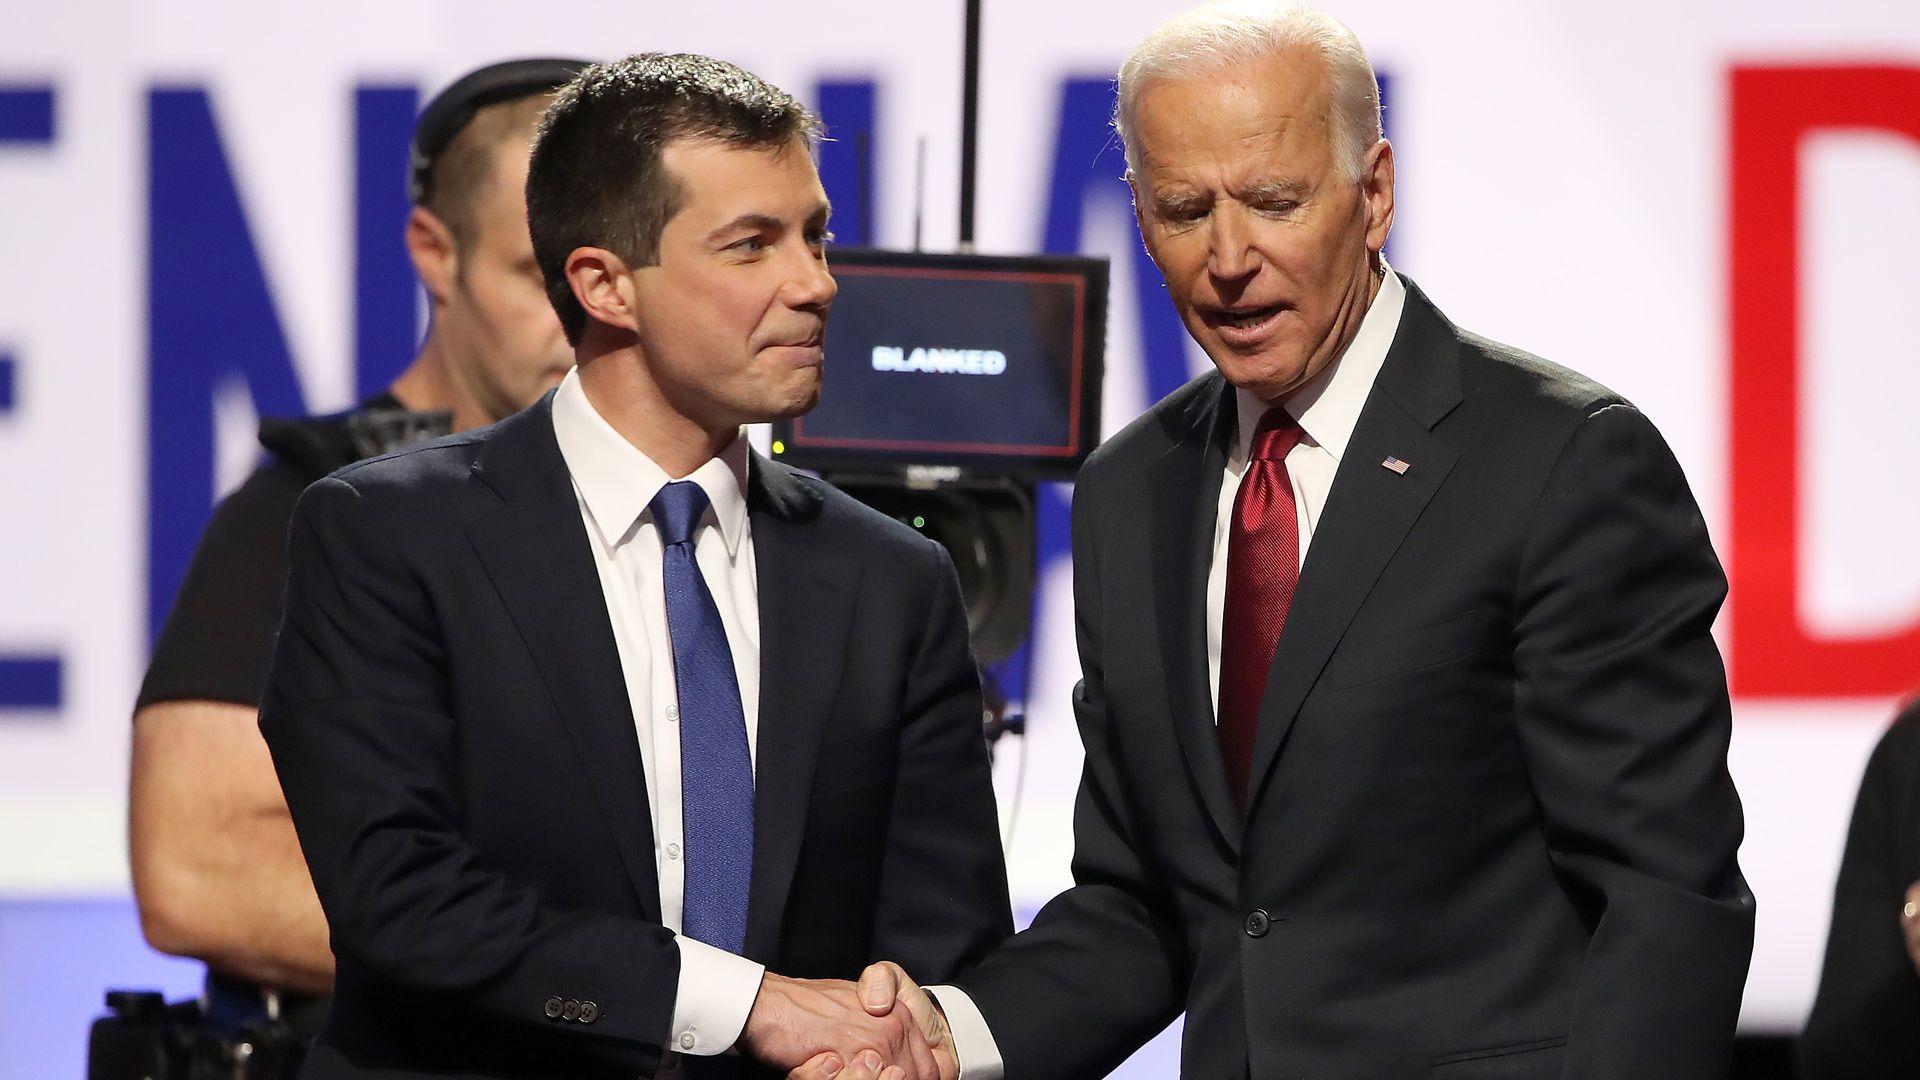 Biden picks Pete Buttigieg as transportation secretary